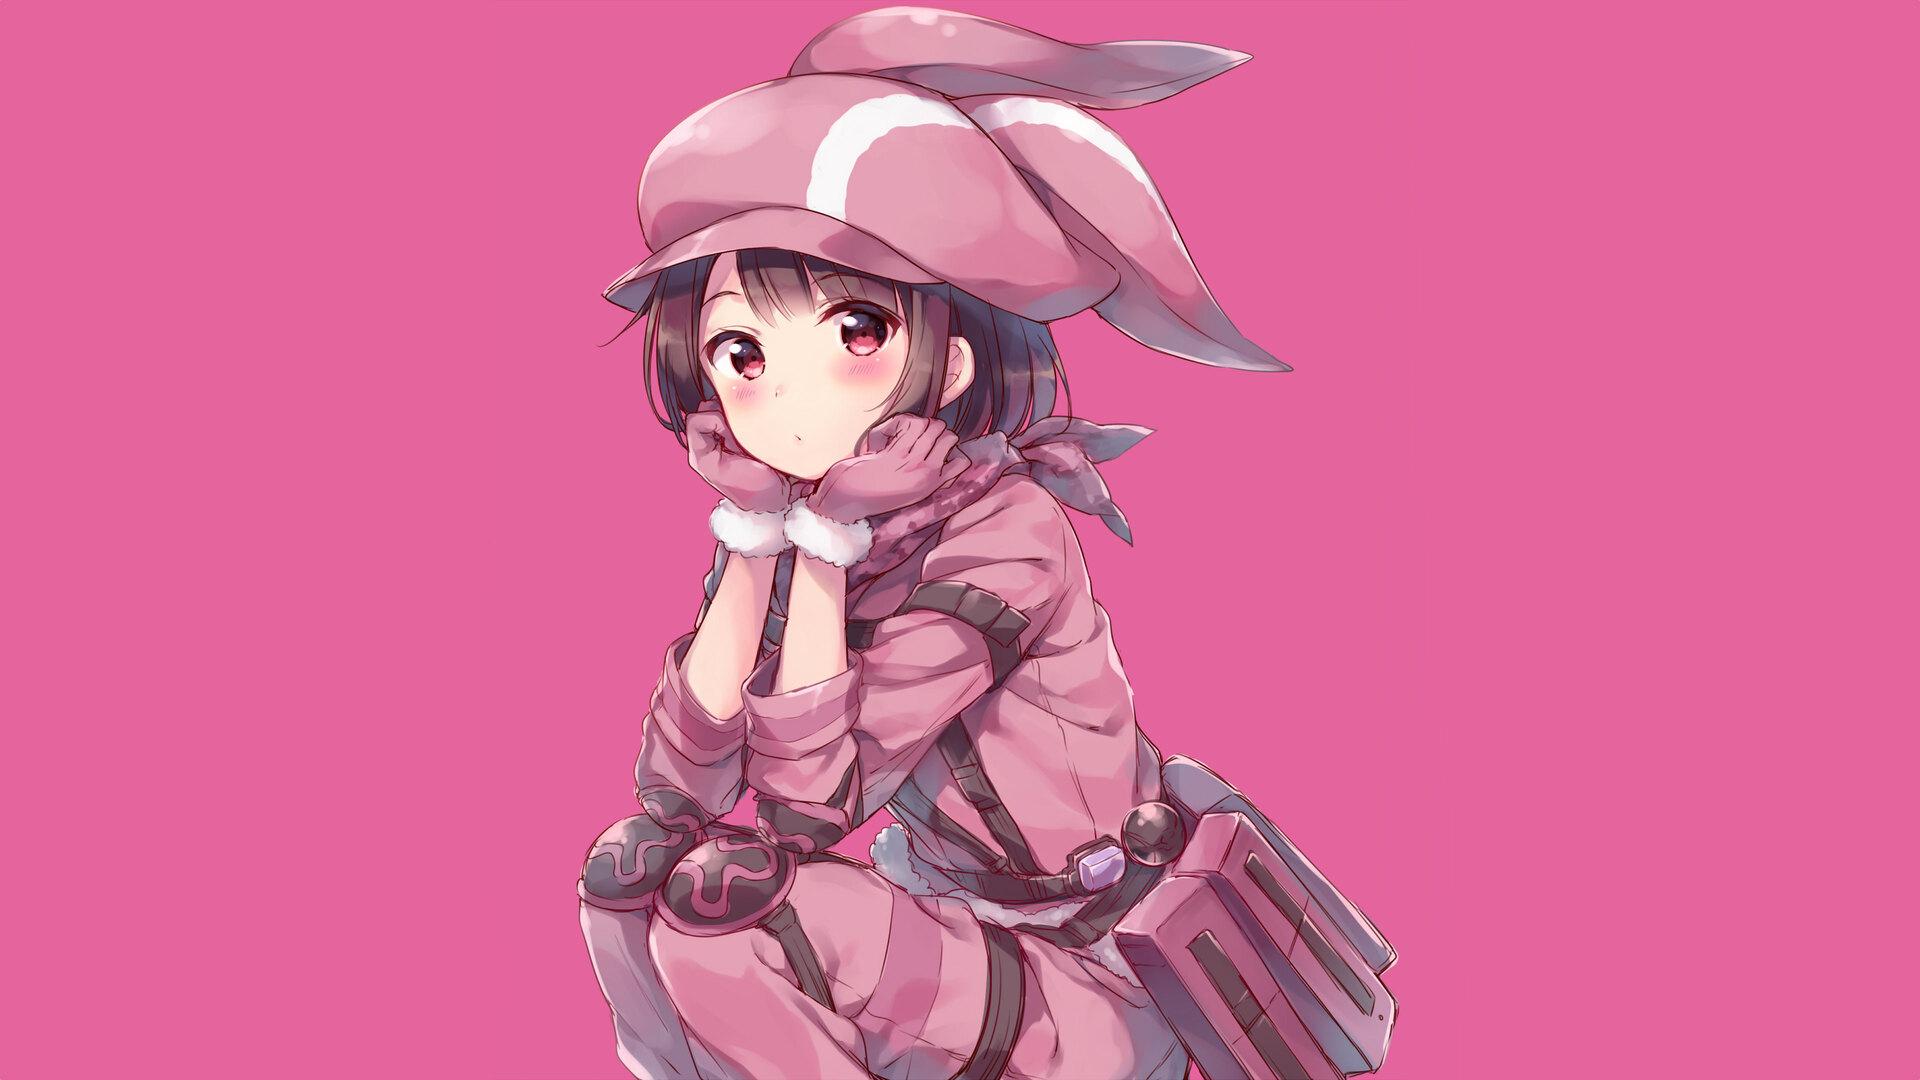 Cute Girl Hd Wallpaper For Mobile 1920x1080 Sword Art Online Alternative Gun Gale Online